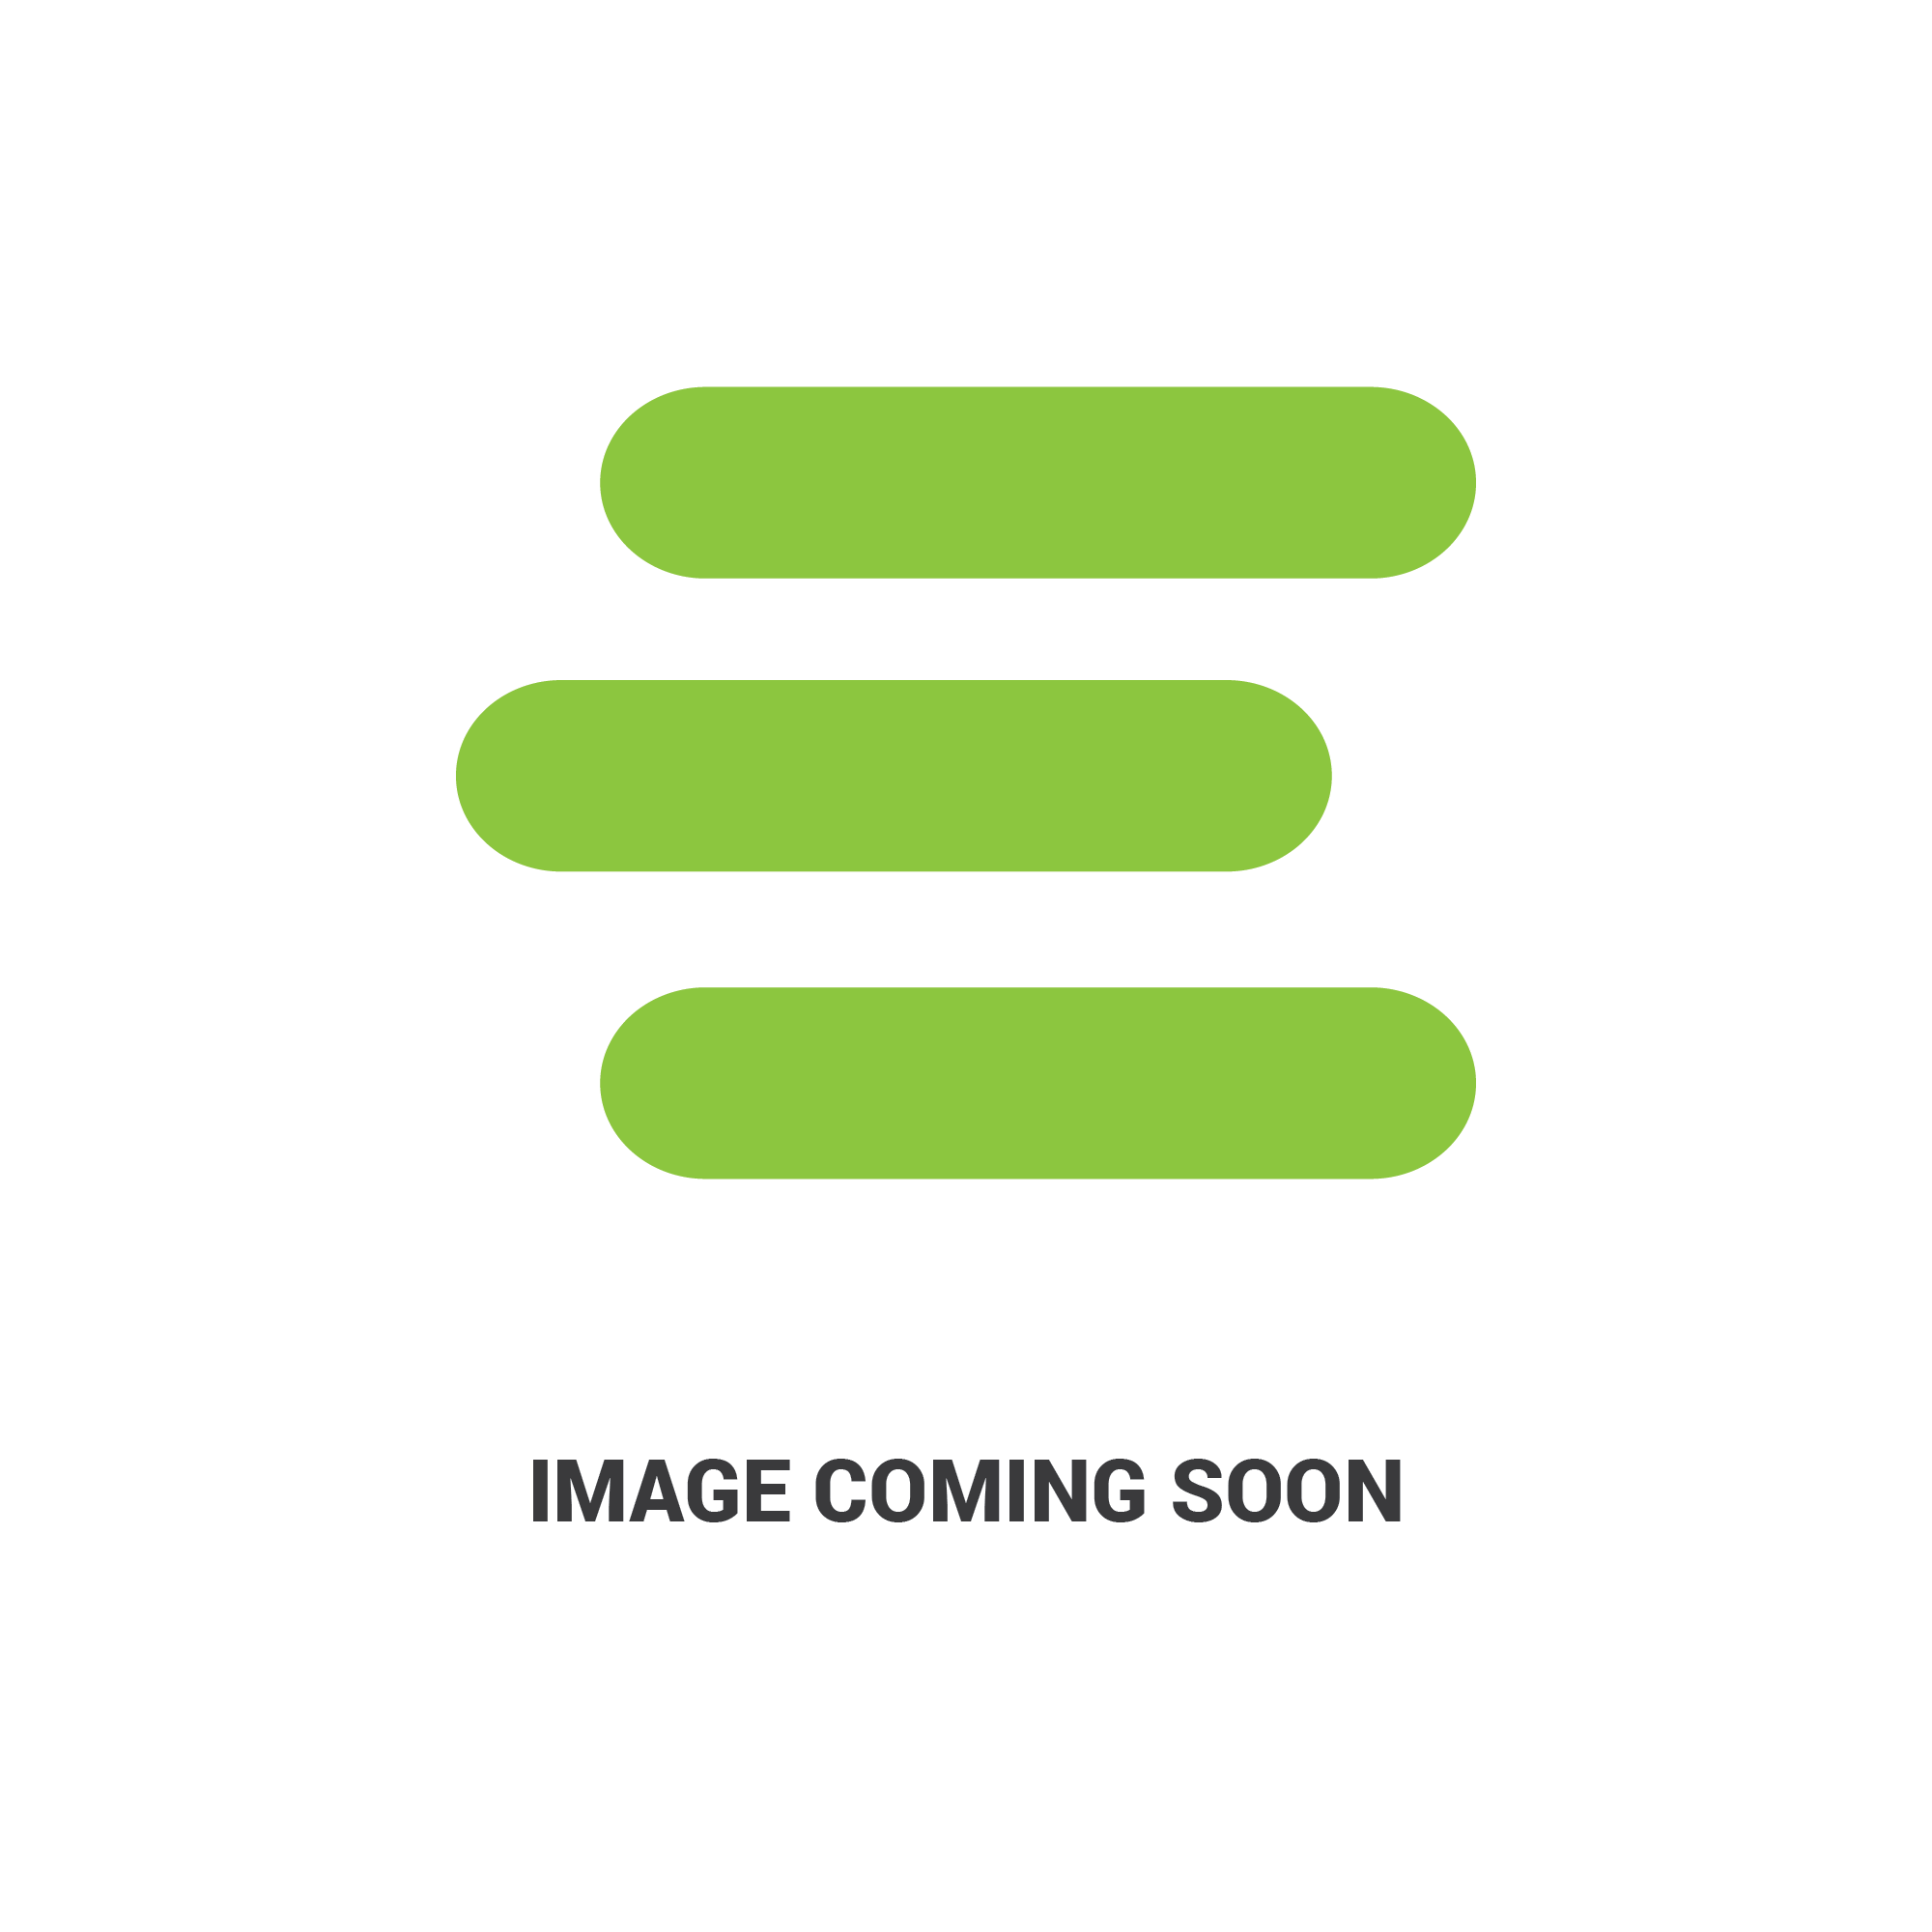 E-7143498edit 1.jpg